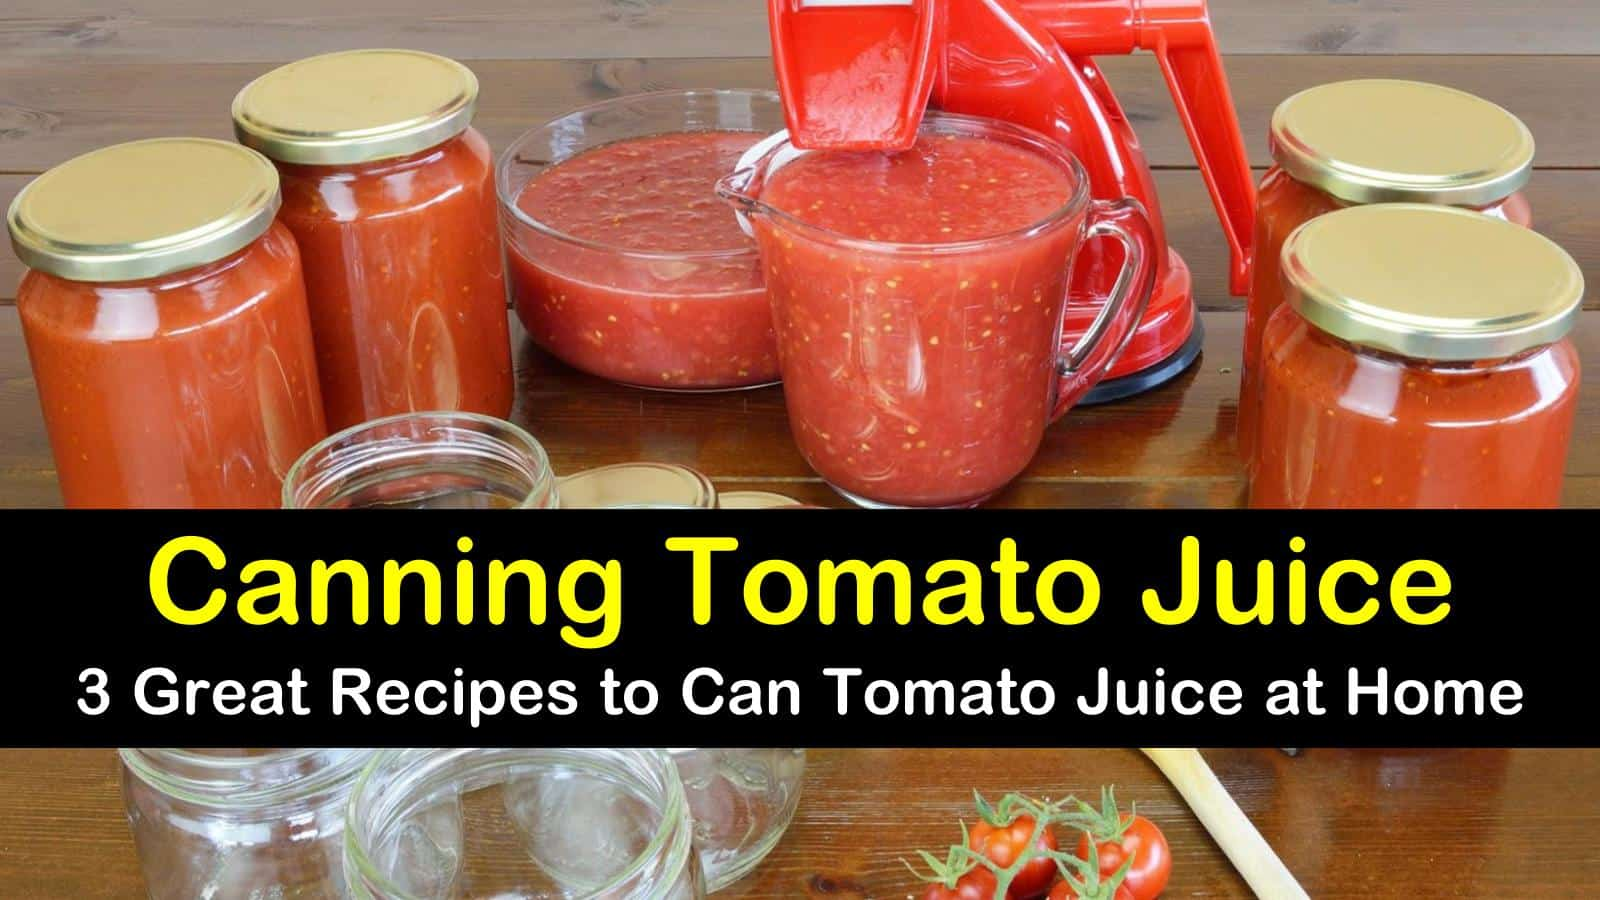 canning tomato juice titleimg1